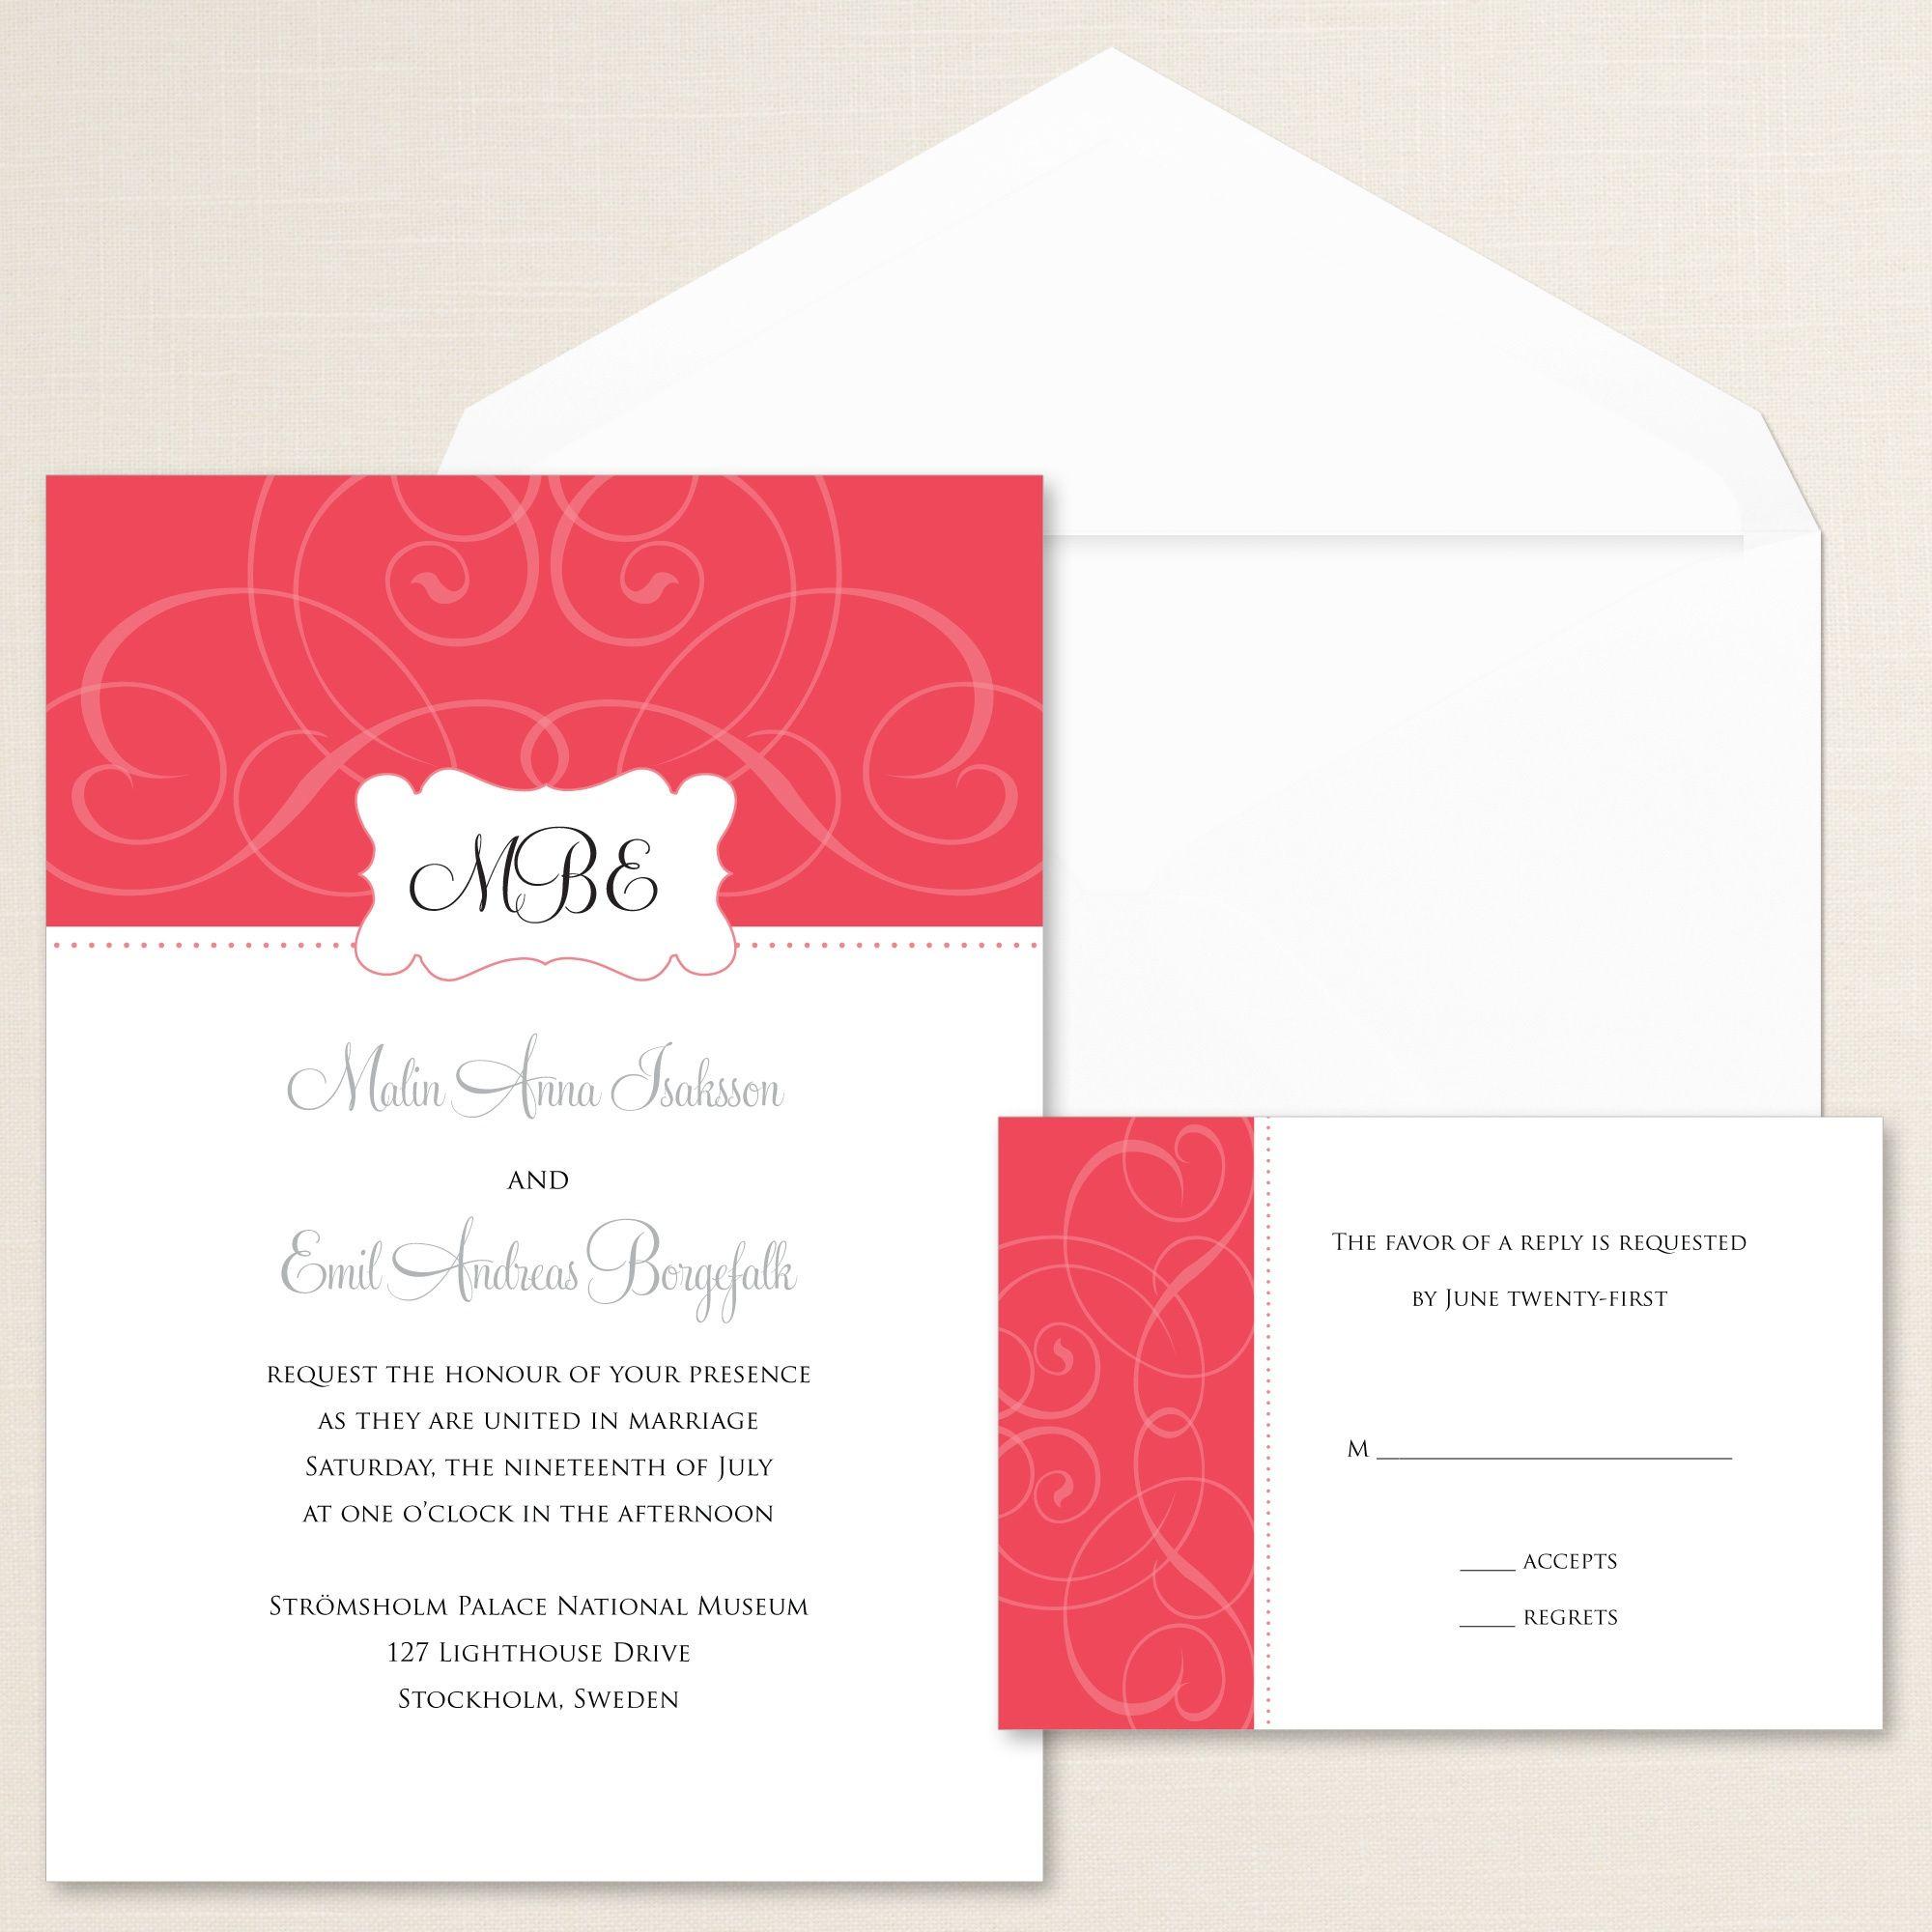 Contemporary Scroll Wedding Invitation | Scroll wedding invitations ...